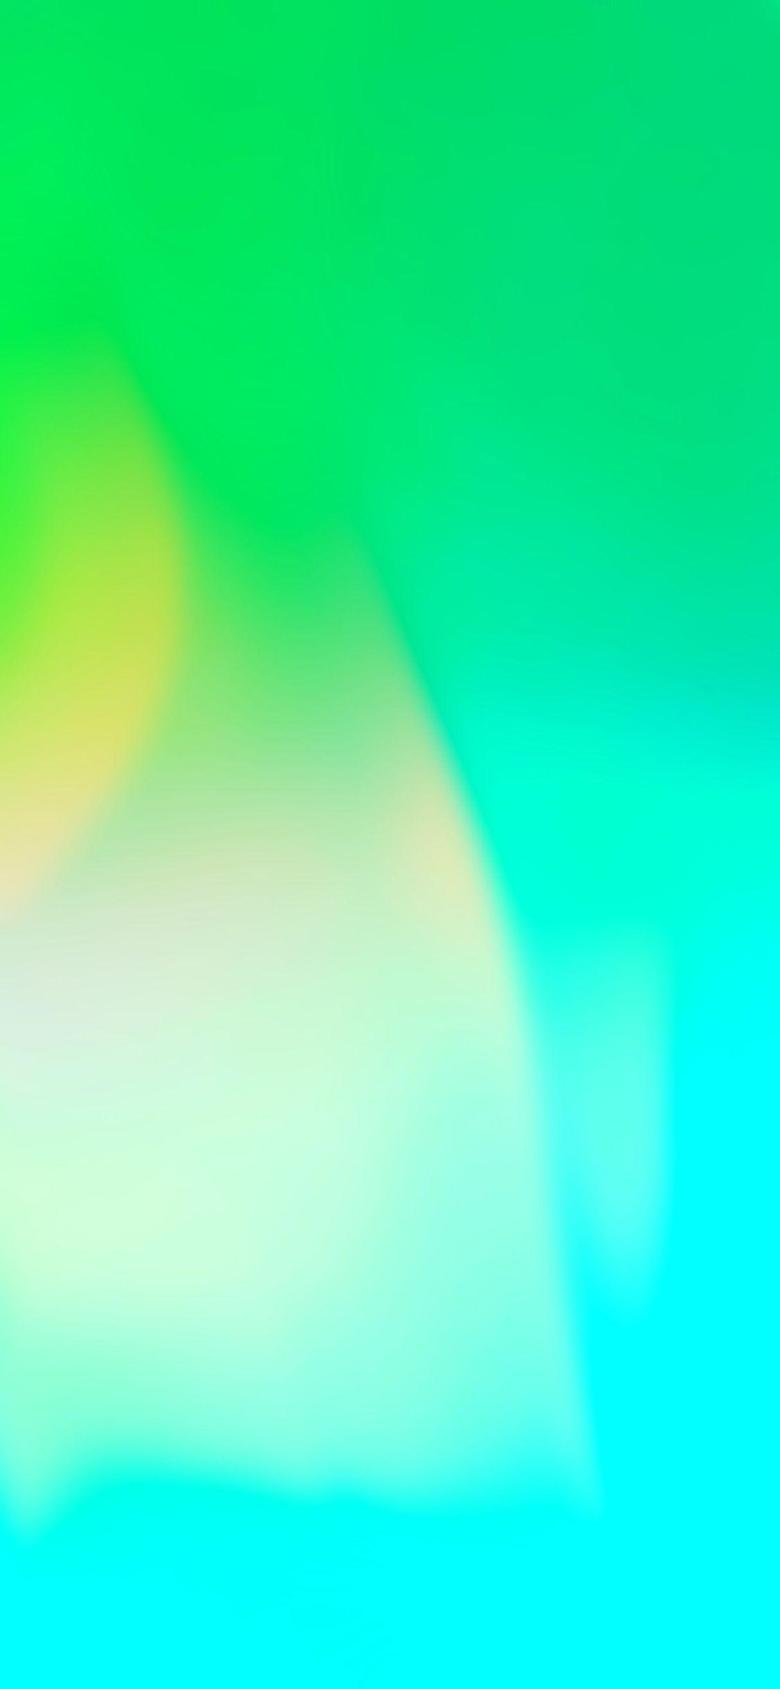 Ios 11 Iphone X Green Aqua Clean Simple Abstract